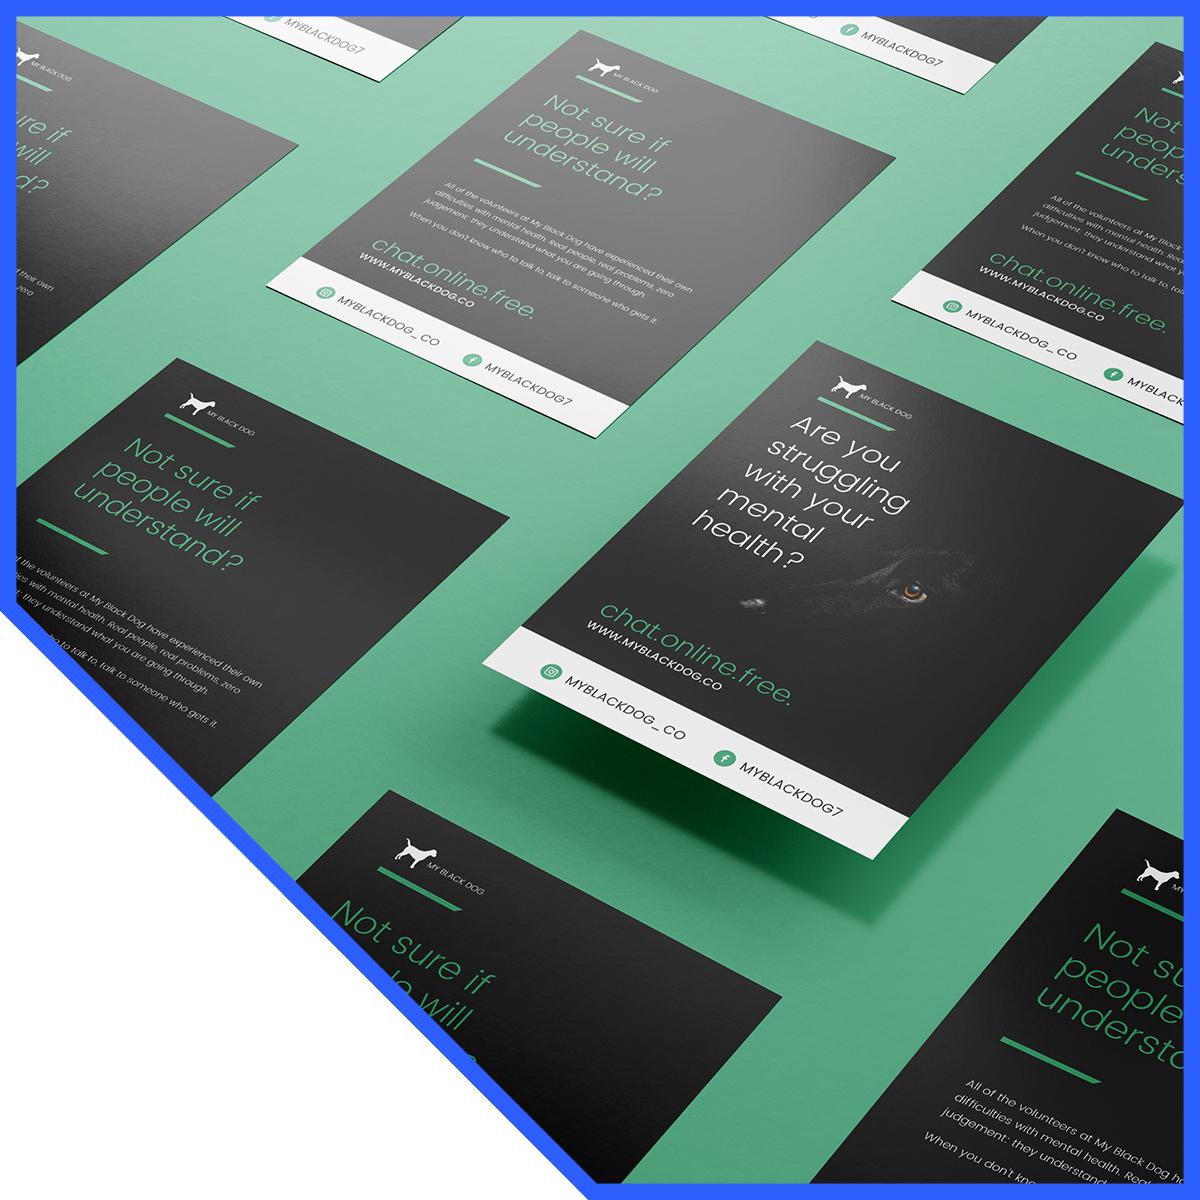 My Black Dog – Digital and Print Marketing